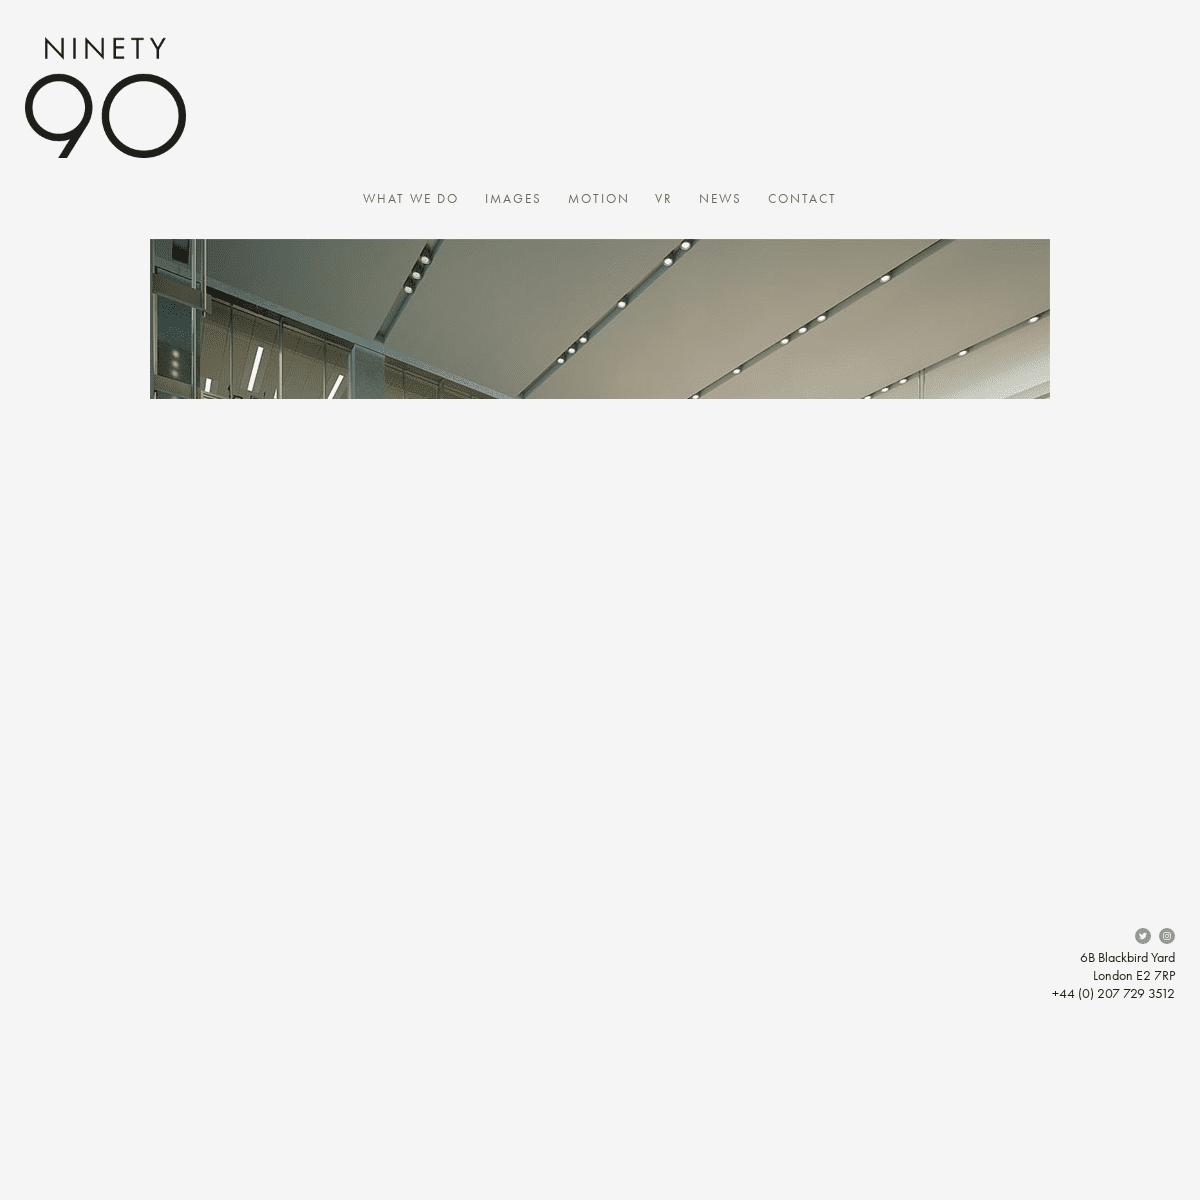 Ninety90 - 3D Visualisation Studio